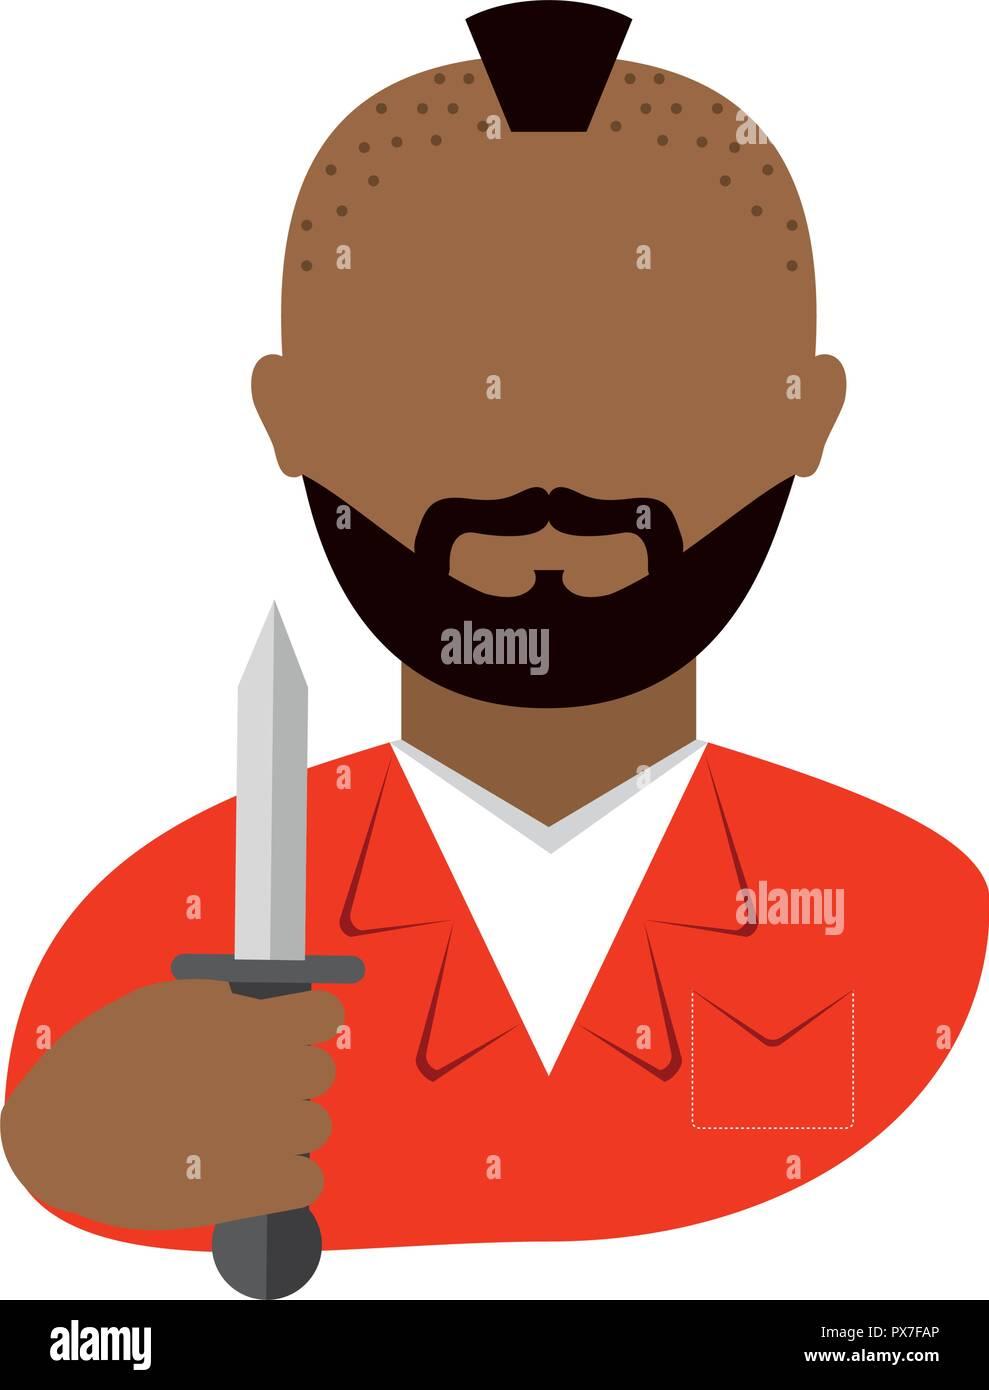 danger bandit with knife avatar character vector illustration design - Stock Image